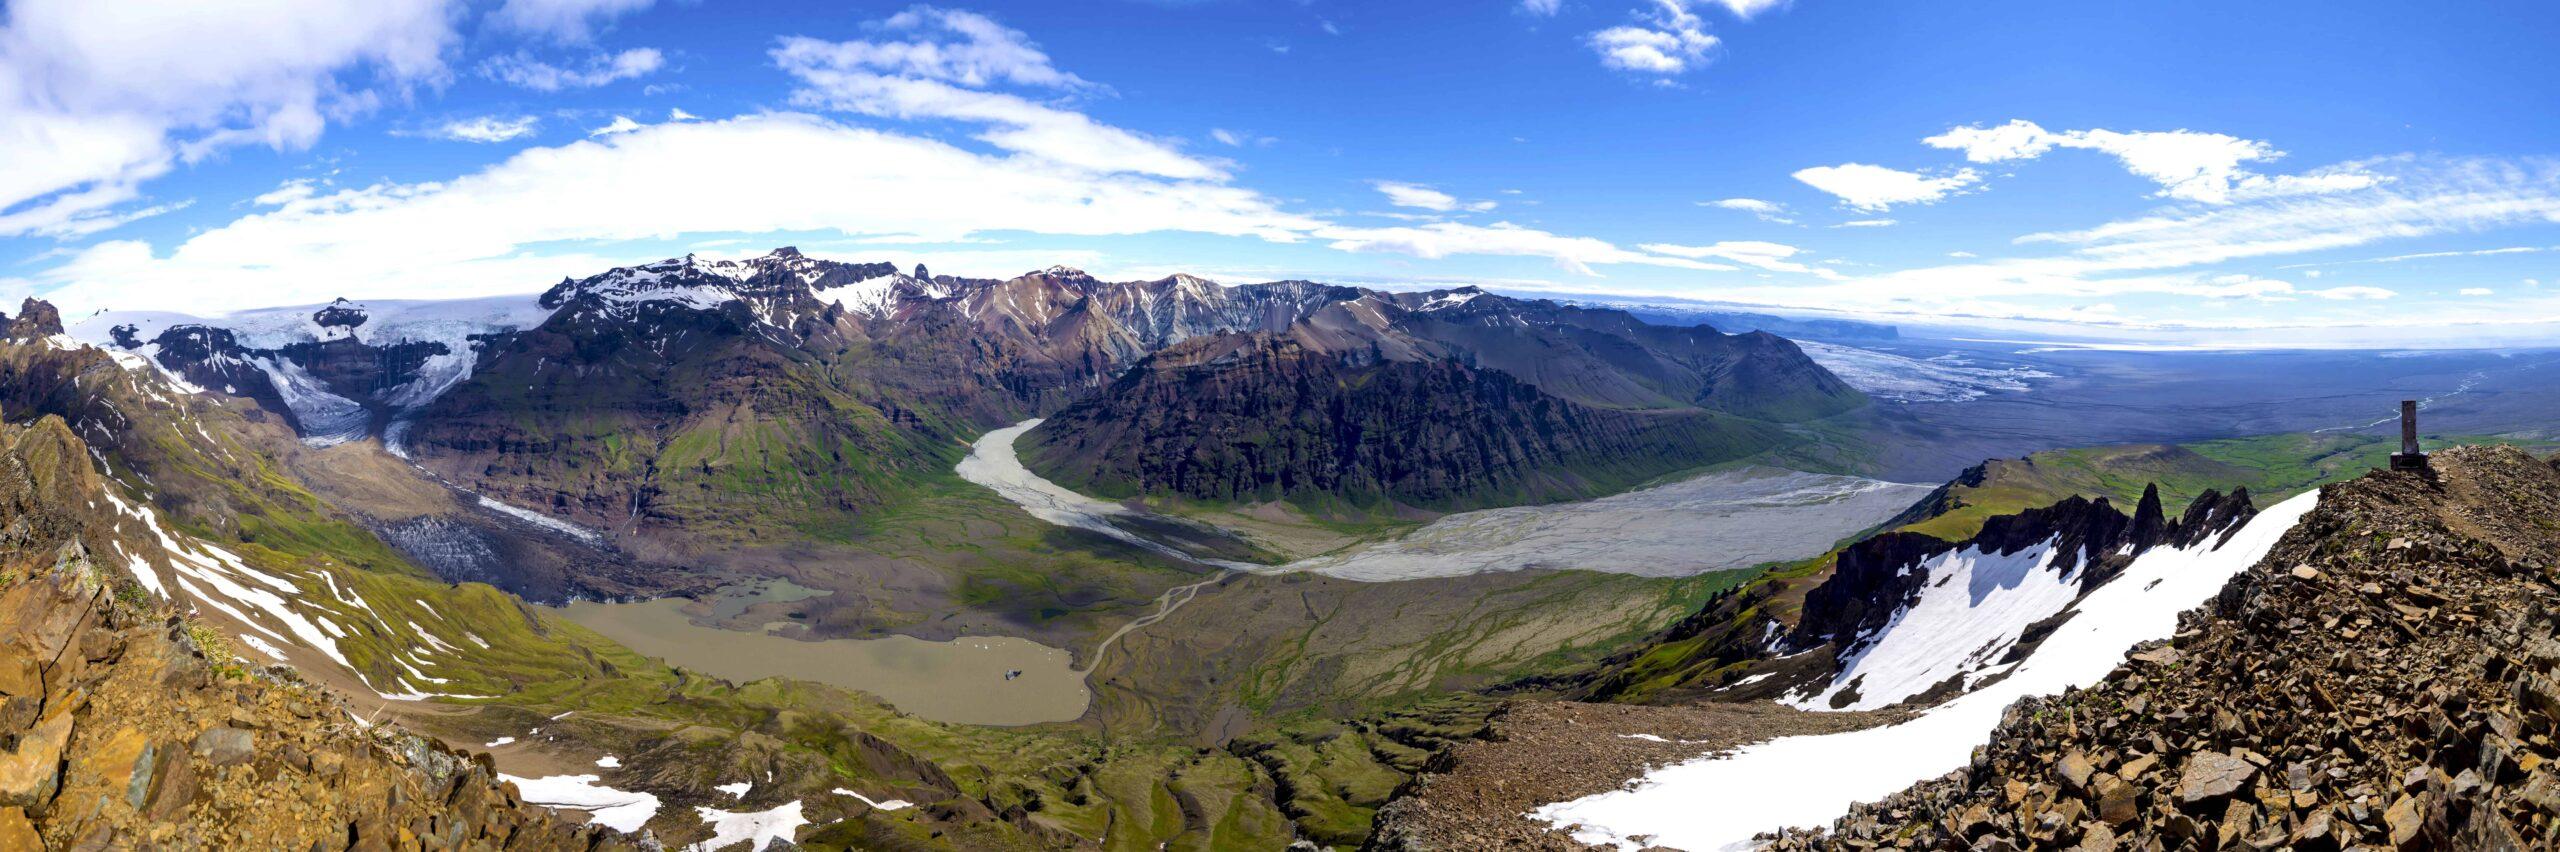 View from Kristínartindar Mountains in Skaftafell Nature Reserve